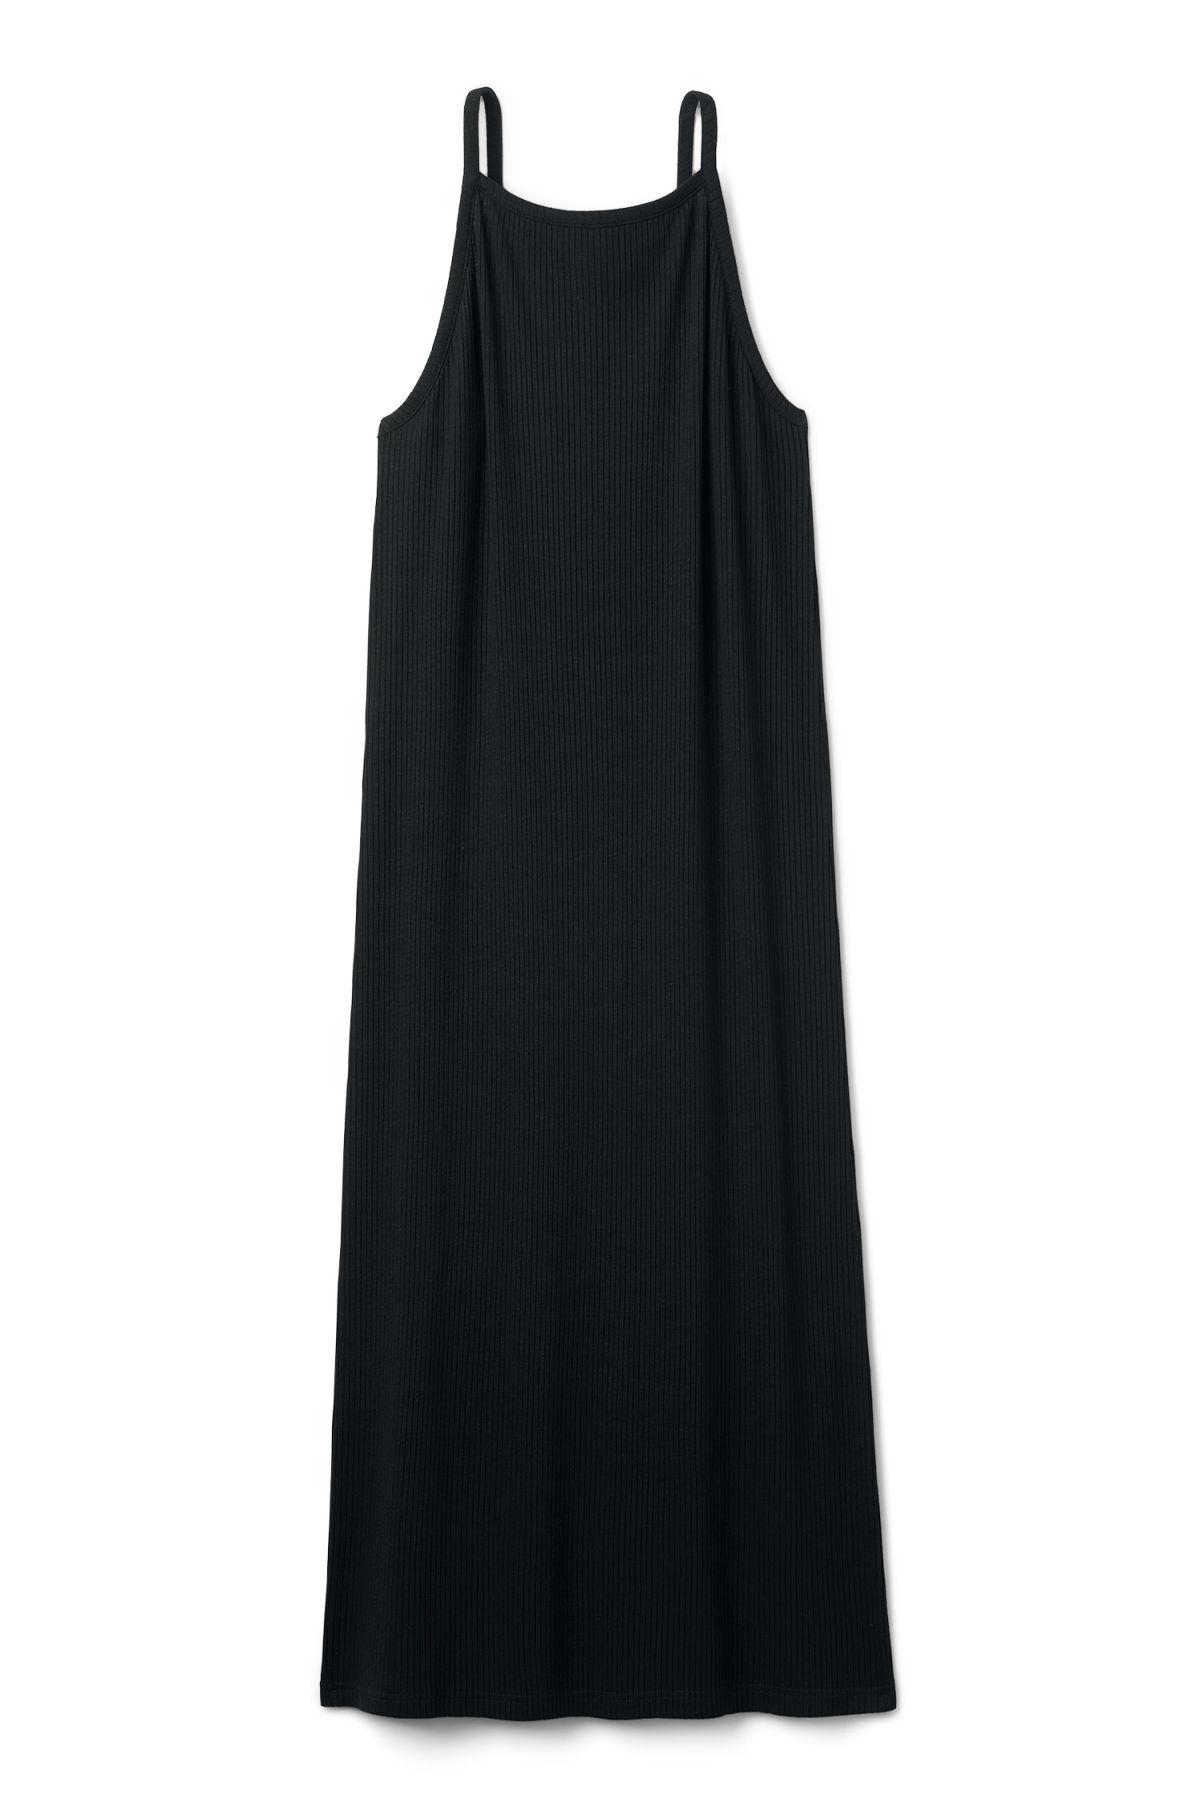 Image of Bella Long Dress - Black-XS